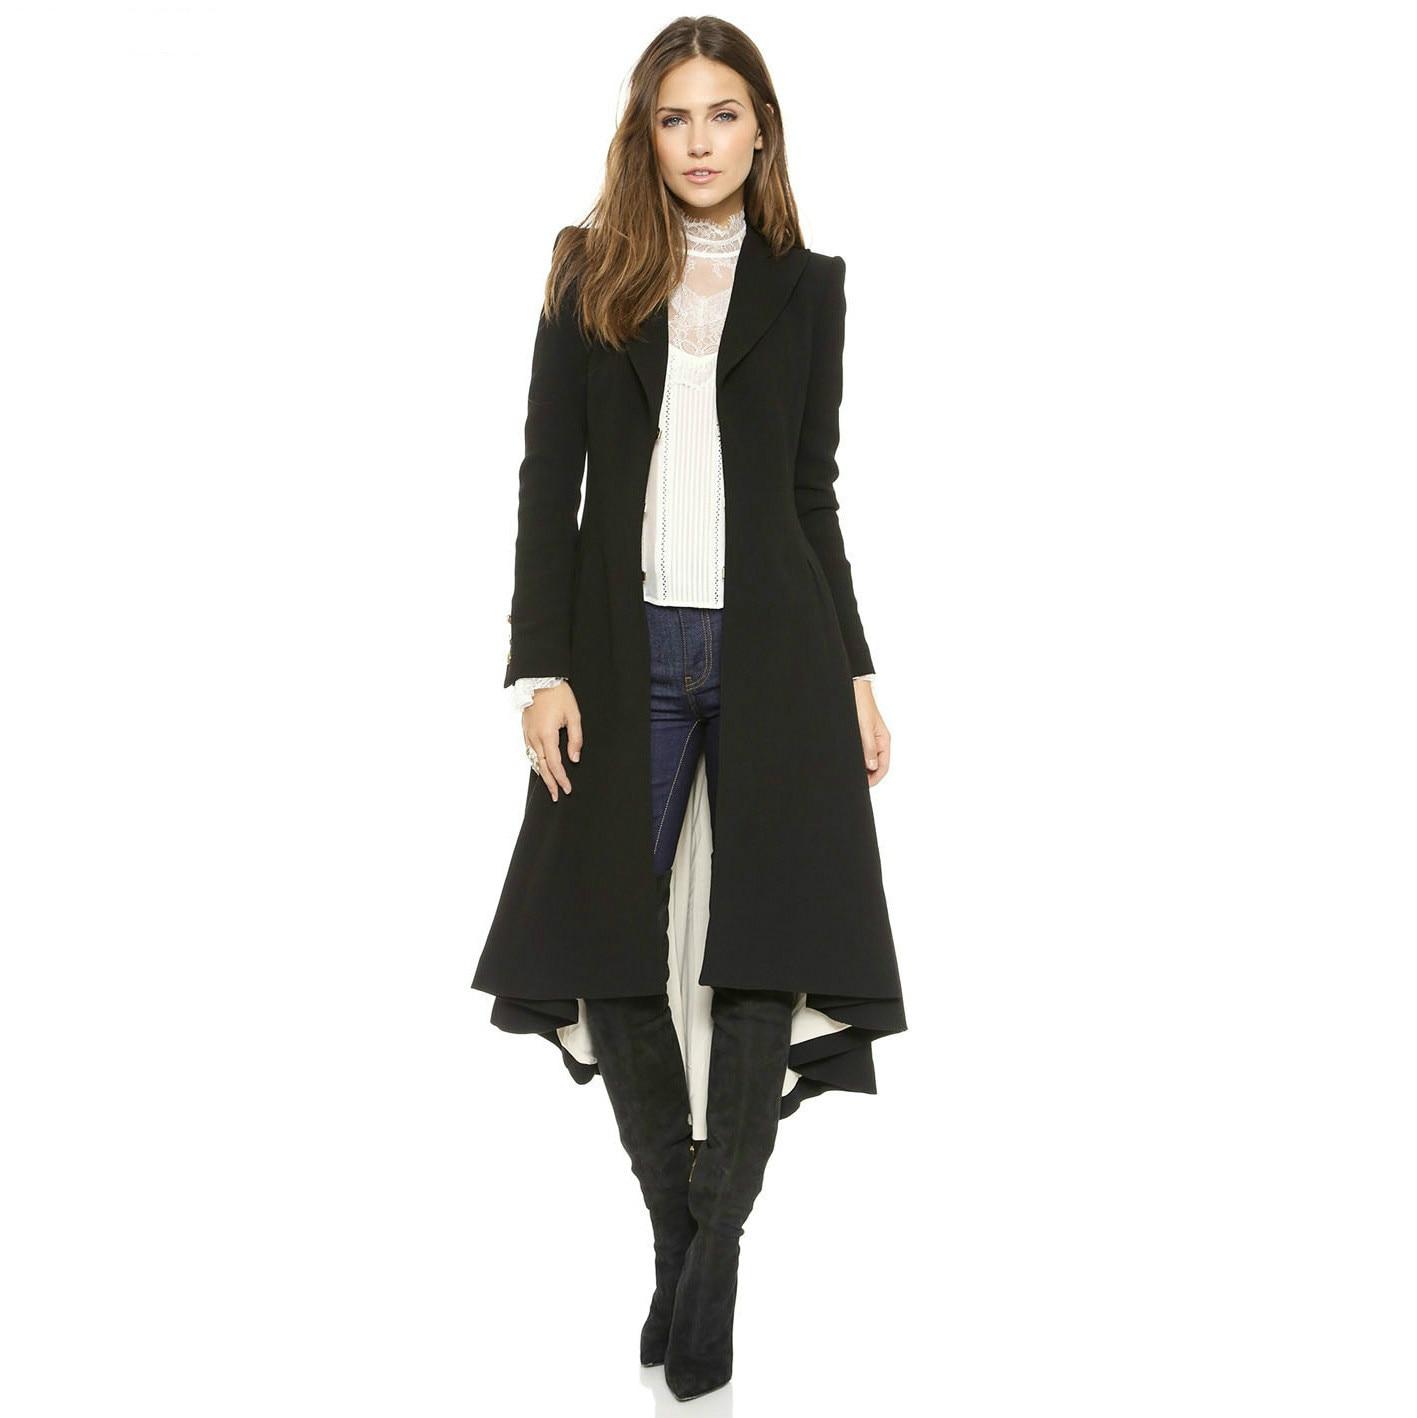 Autumn Winter Women Swallowtail Woolen Long Black Trench Dovetail Slim Blazer Dress 4XL 5XL Plus Size Goth Trench Outwear